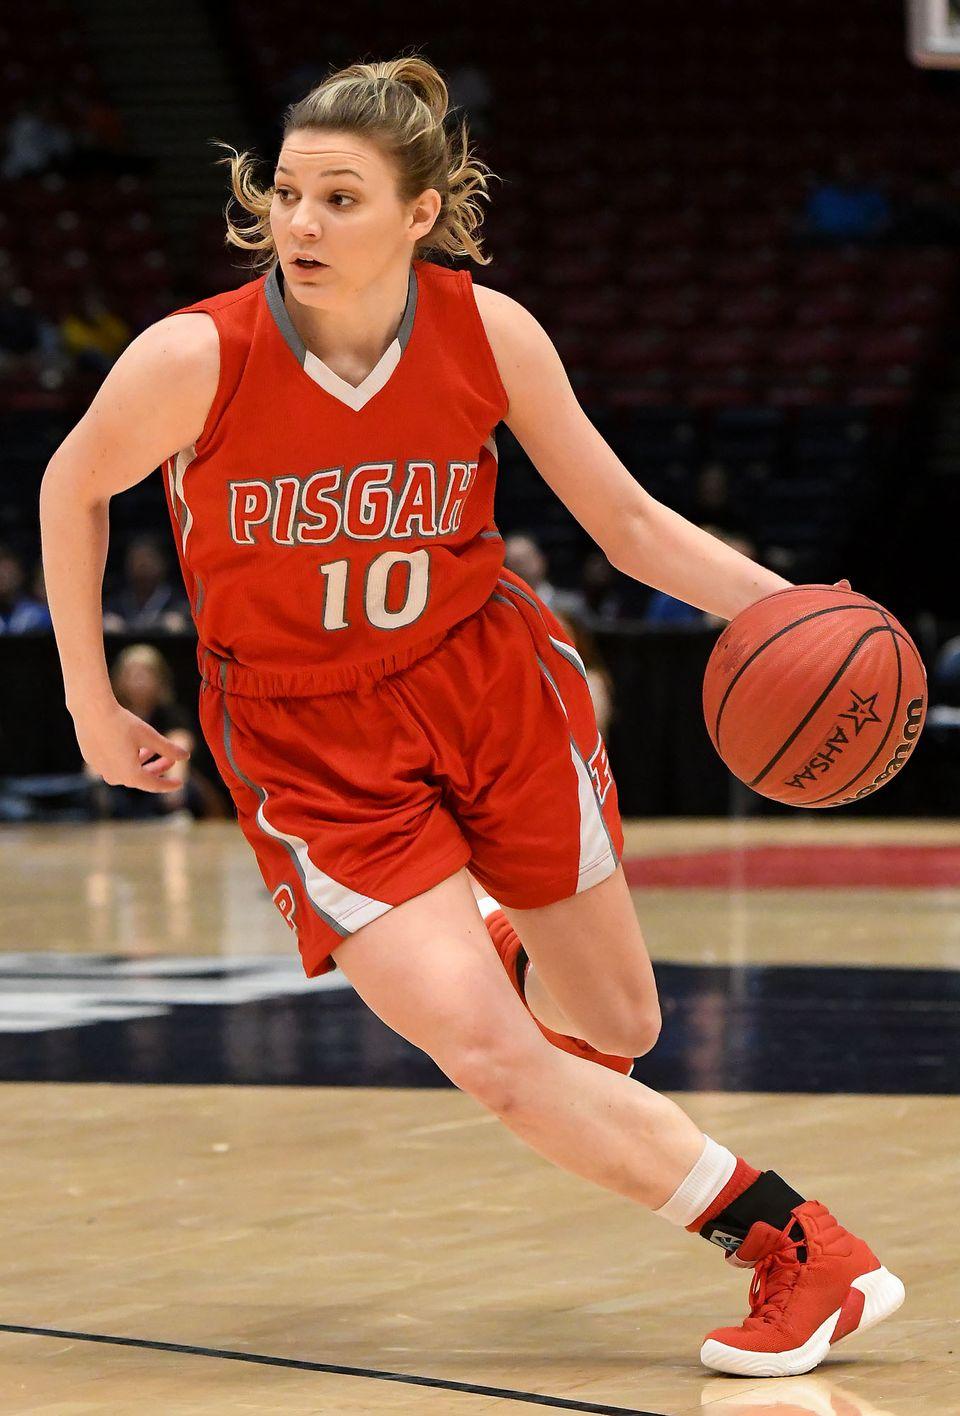 Pisgah's Annie Hughes, Mountain Brook's Trendon Watford Named ASWA Miss Basketball & Mr. Basketball